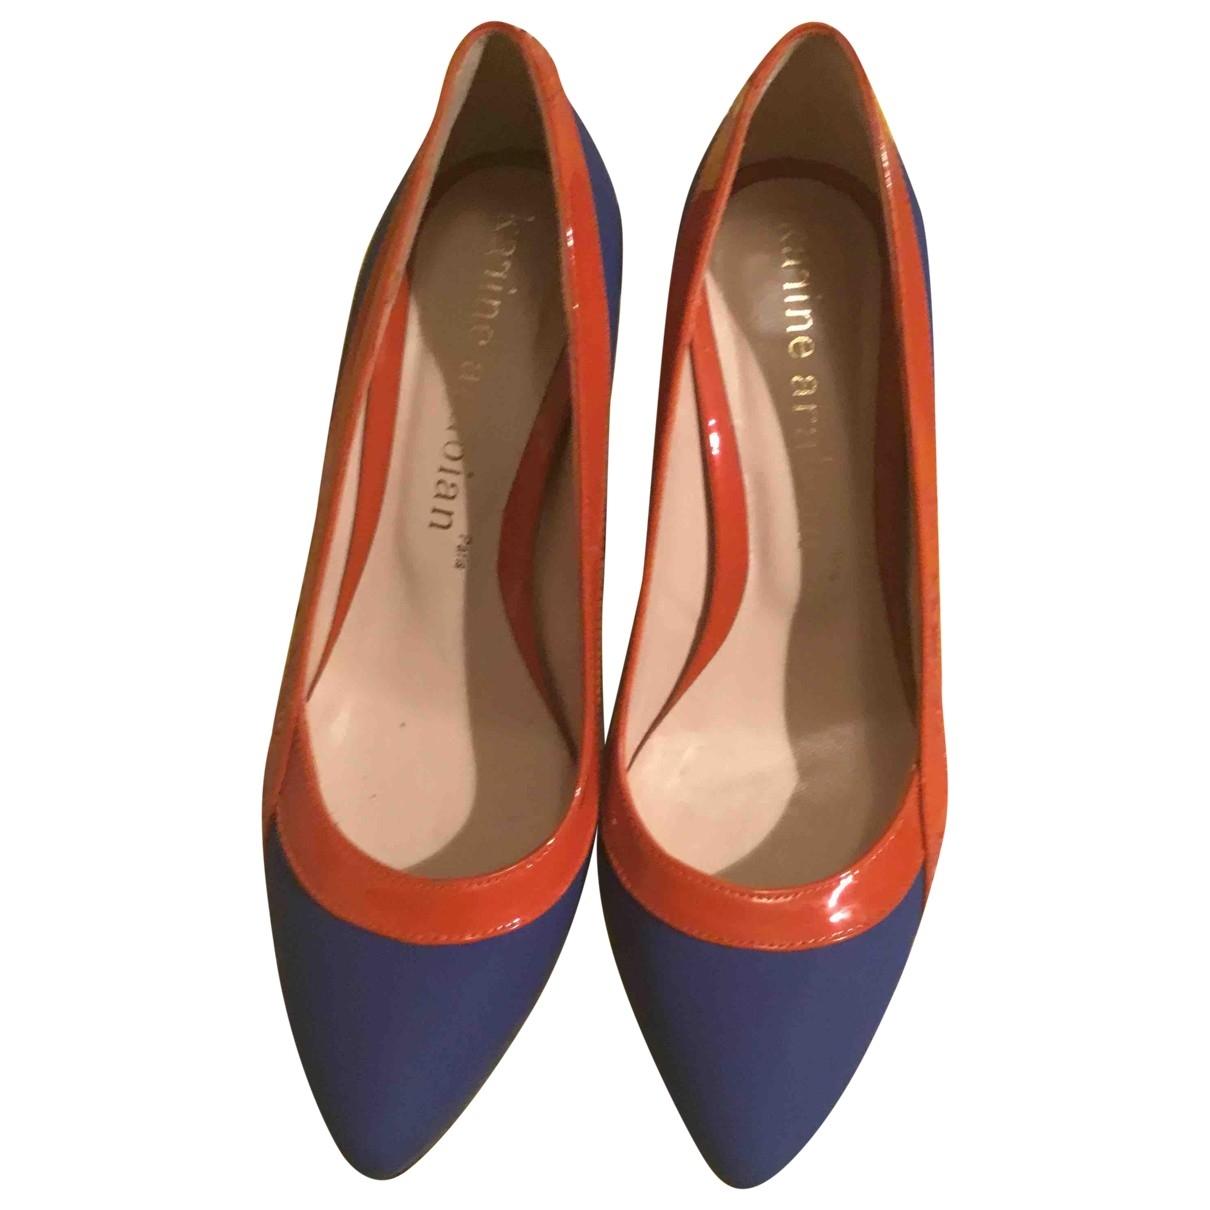 Karine Arabian - Escarpins   pour femme en cuir - bleu